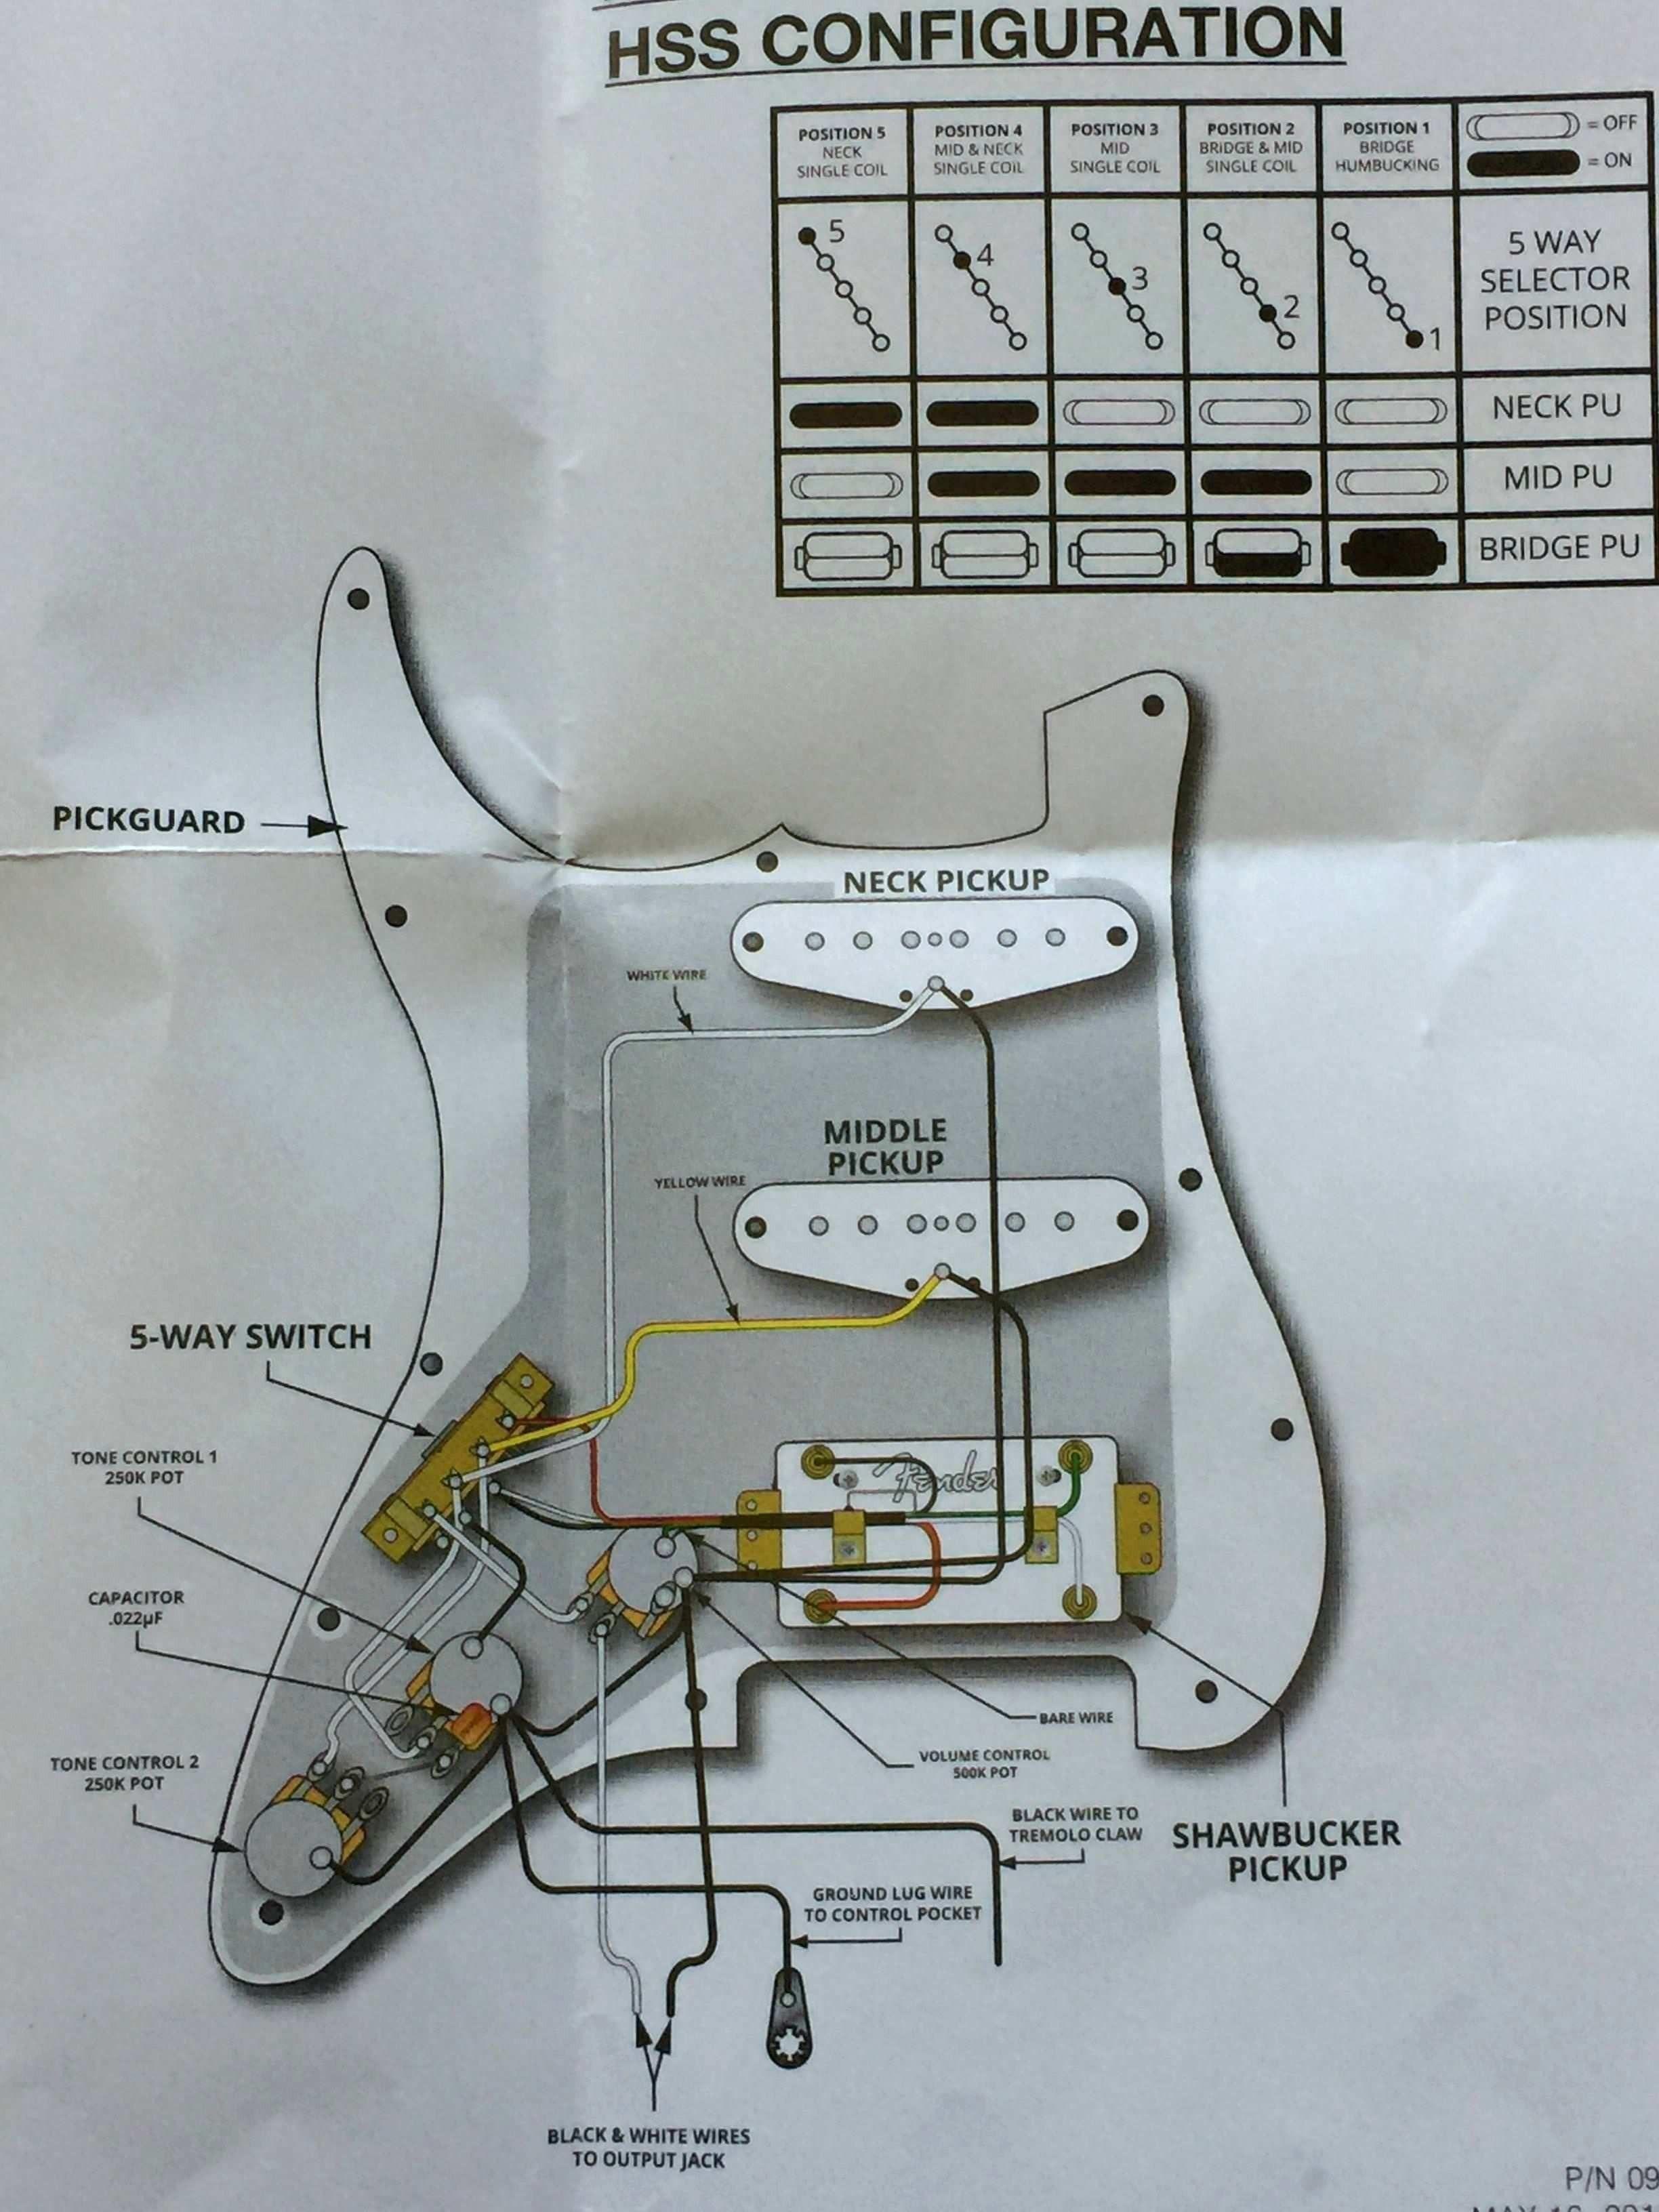 New Wiring Diagram Fender 5way Switch Ovation guitar